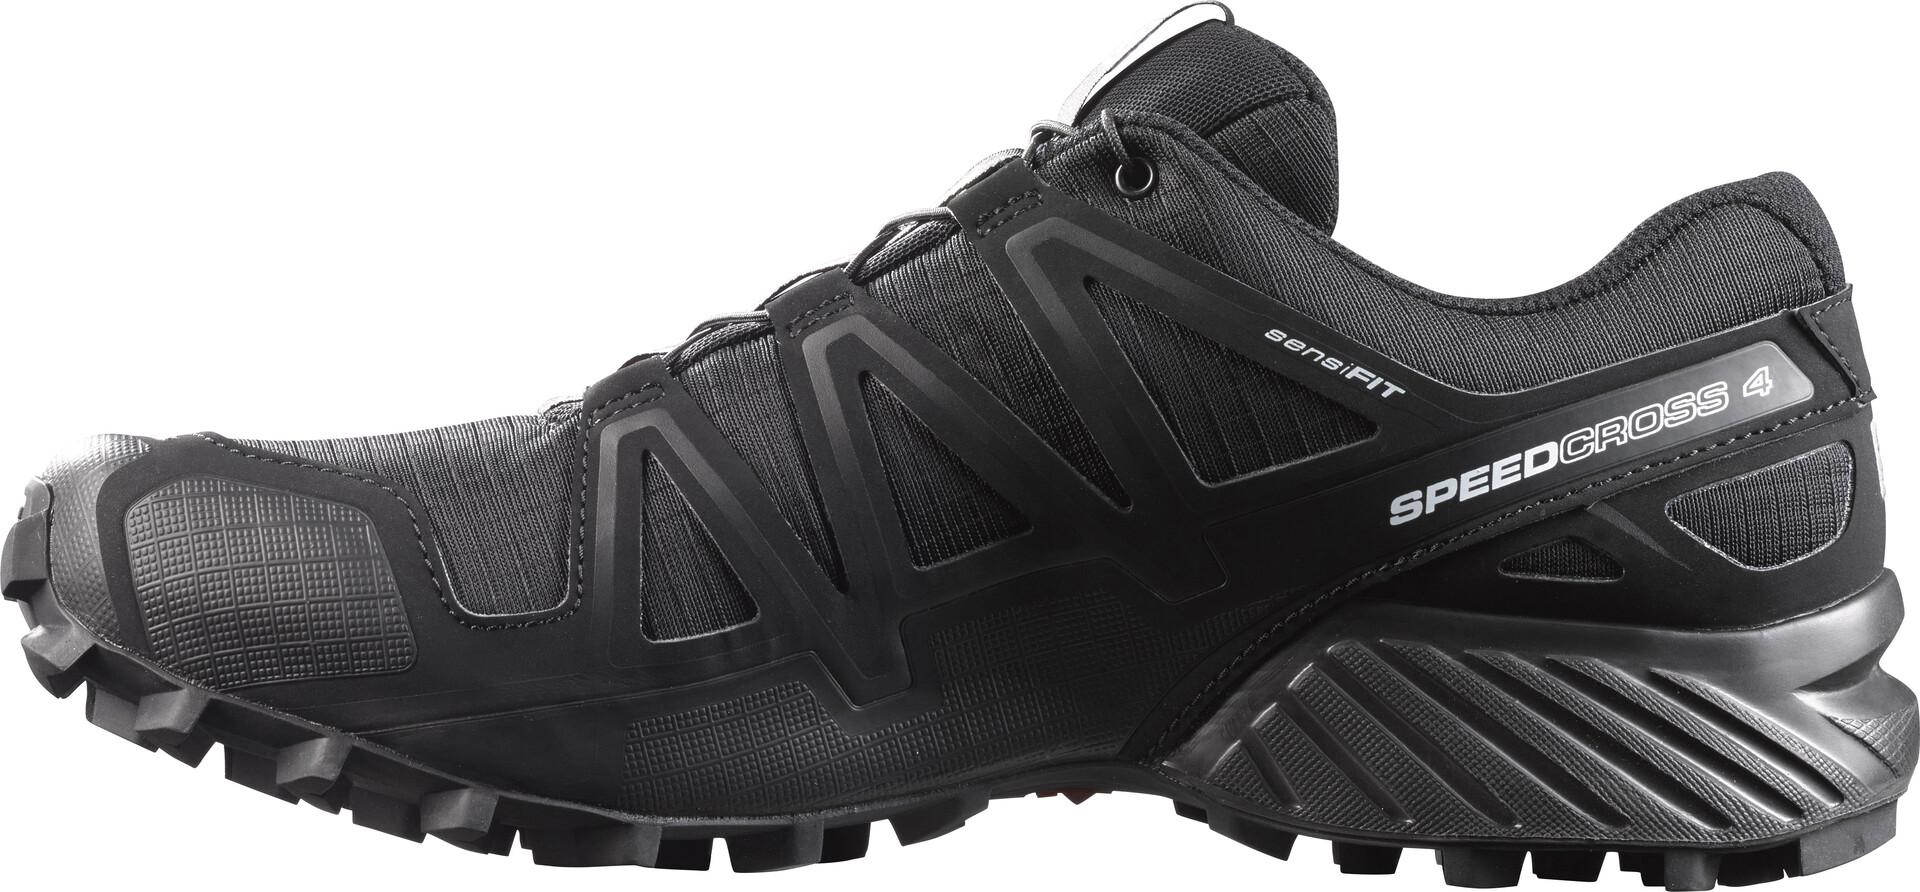 Salomon Speedcross Homme noir 4 sur CAMPZ Chaussures running 345RAjL